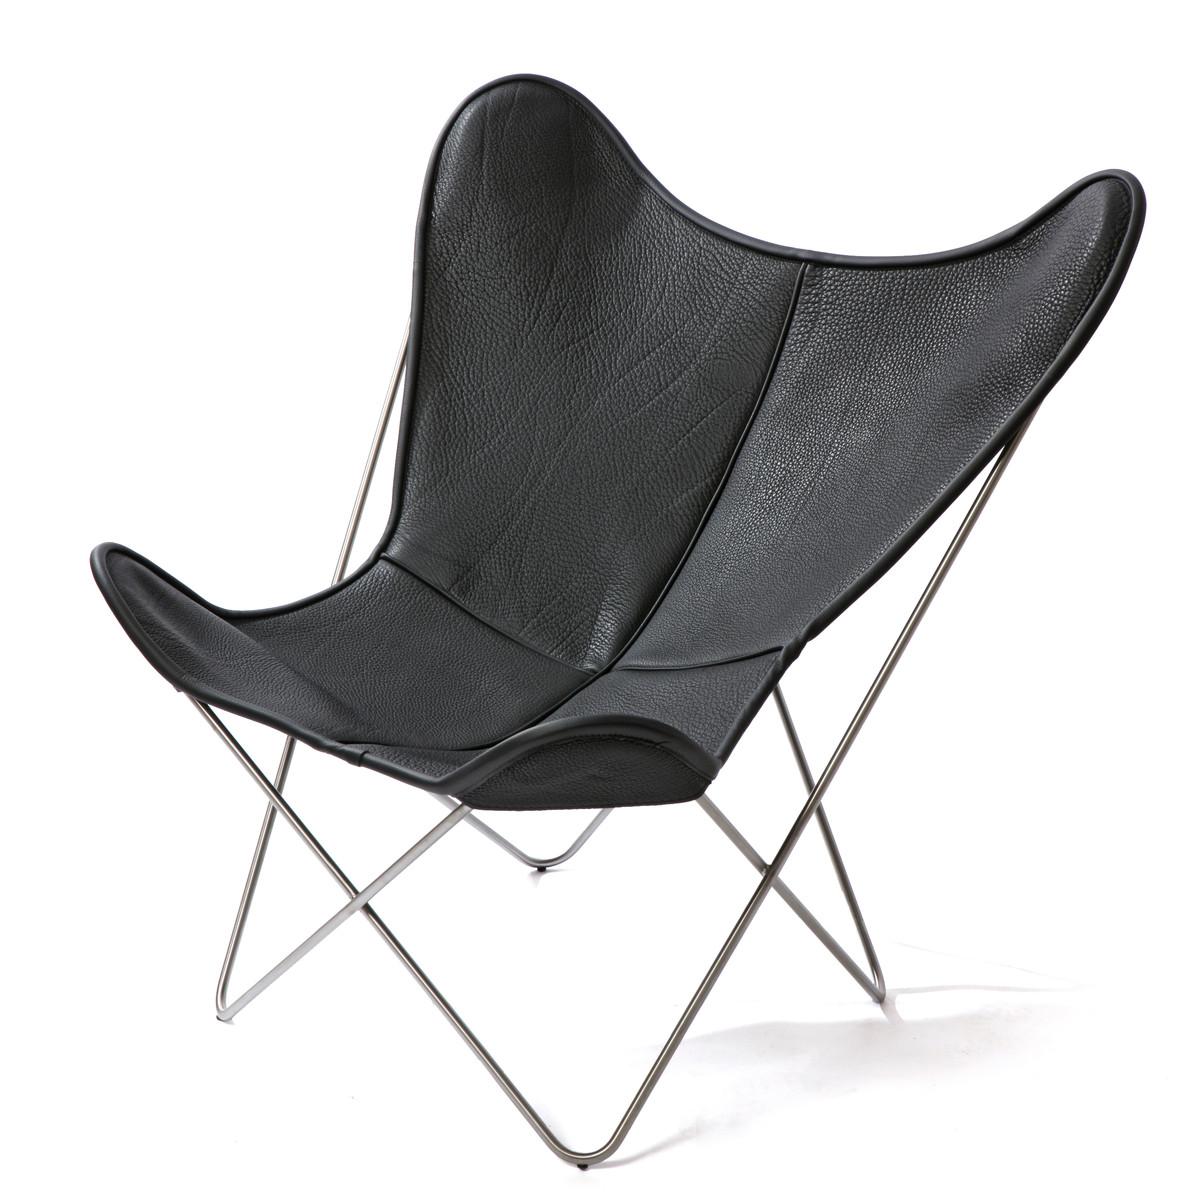 design friday the b f k chair jorge ferrari hardoy. Black Bedroom Furniture Sets. Home Design Ideas